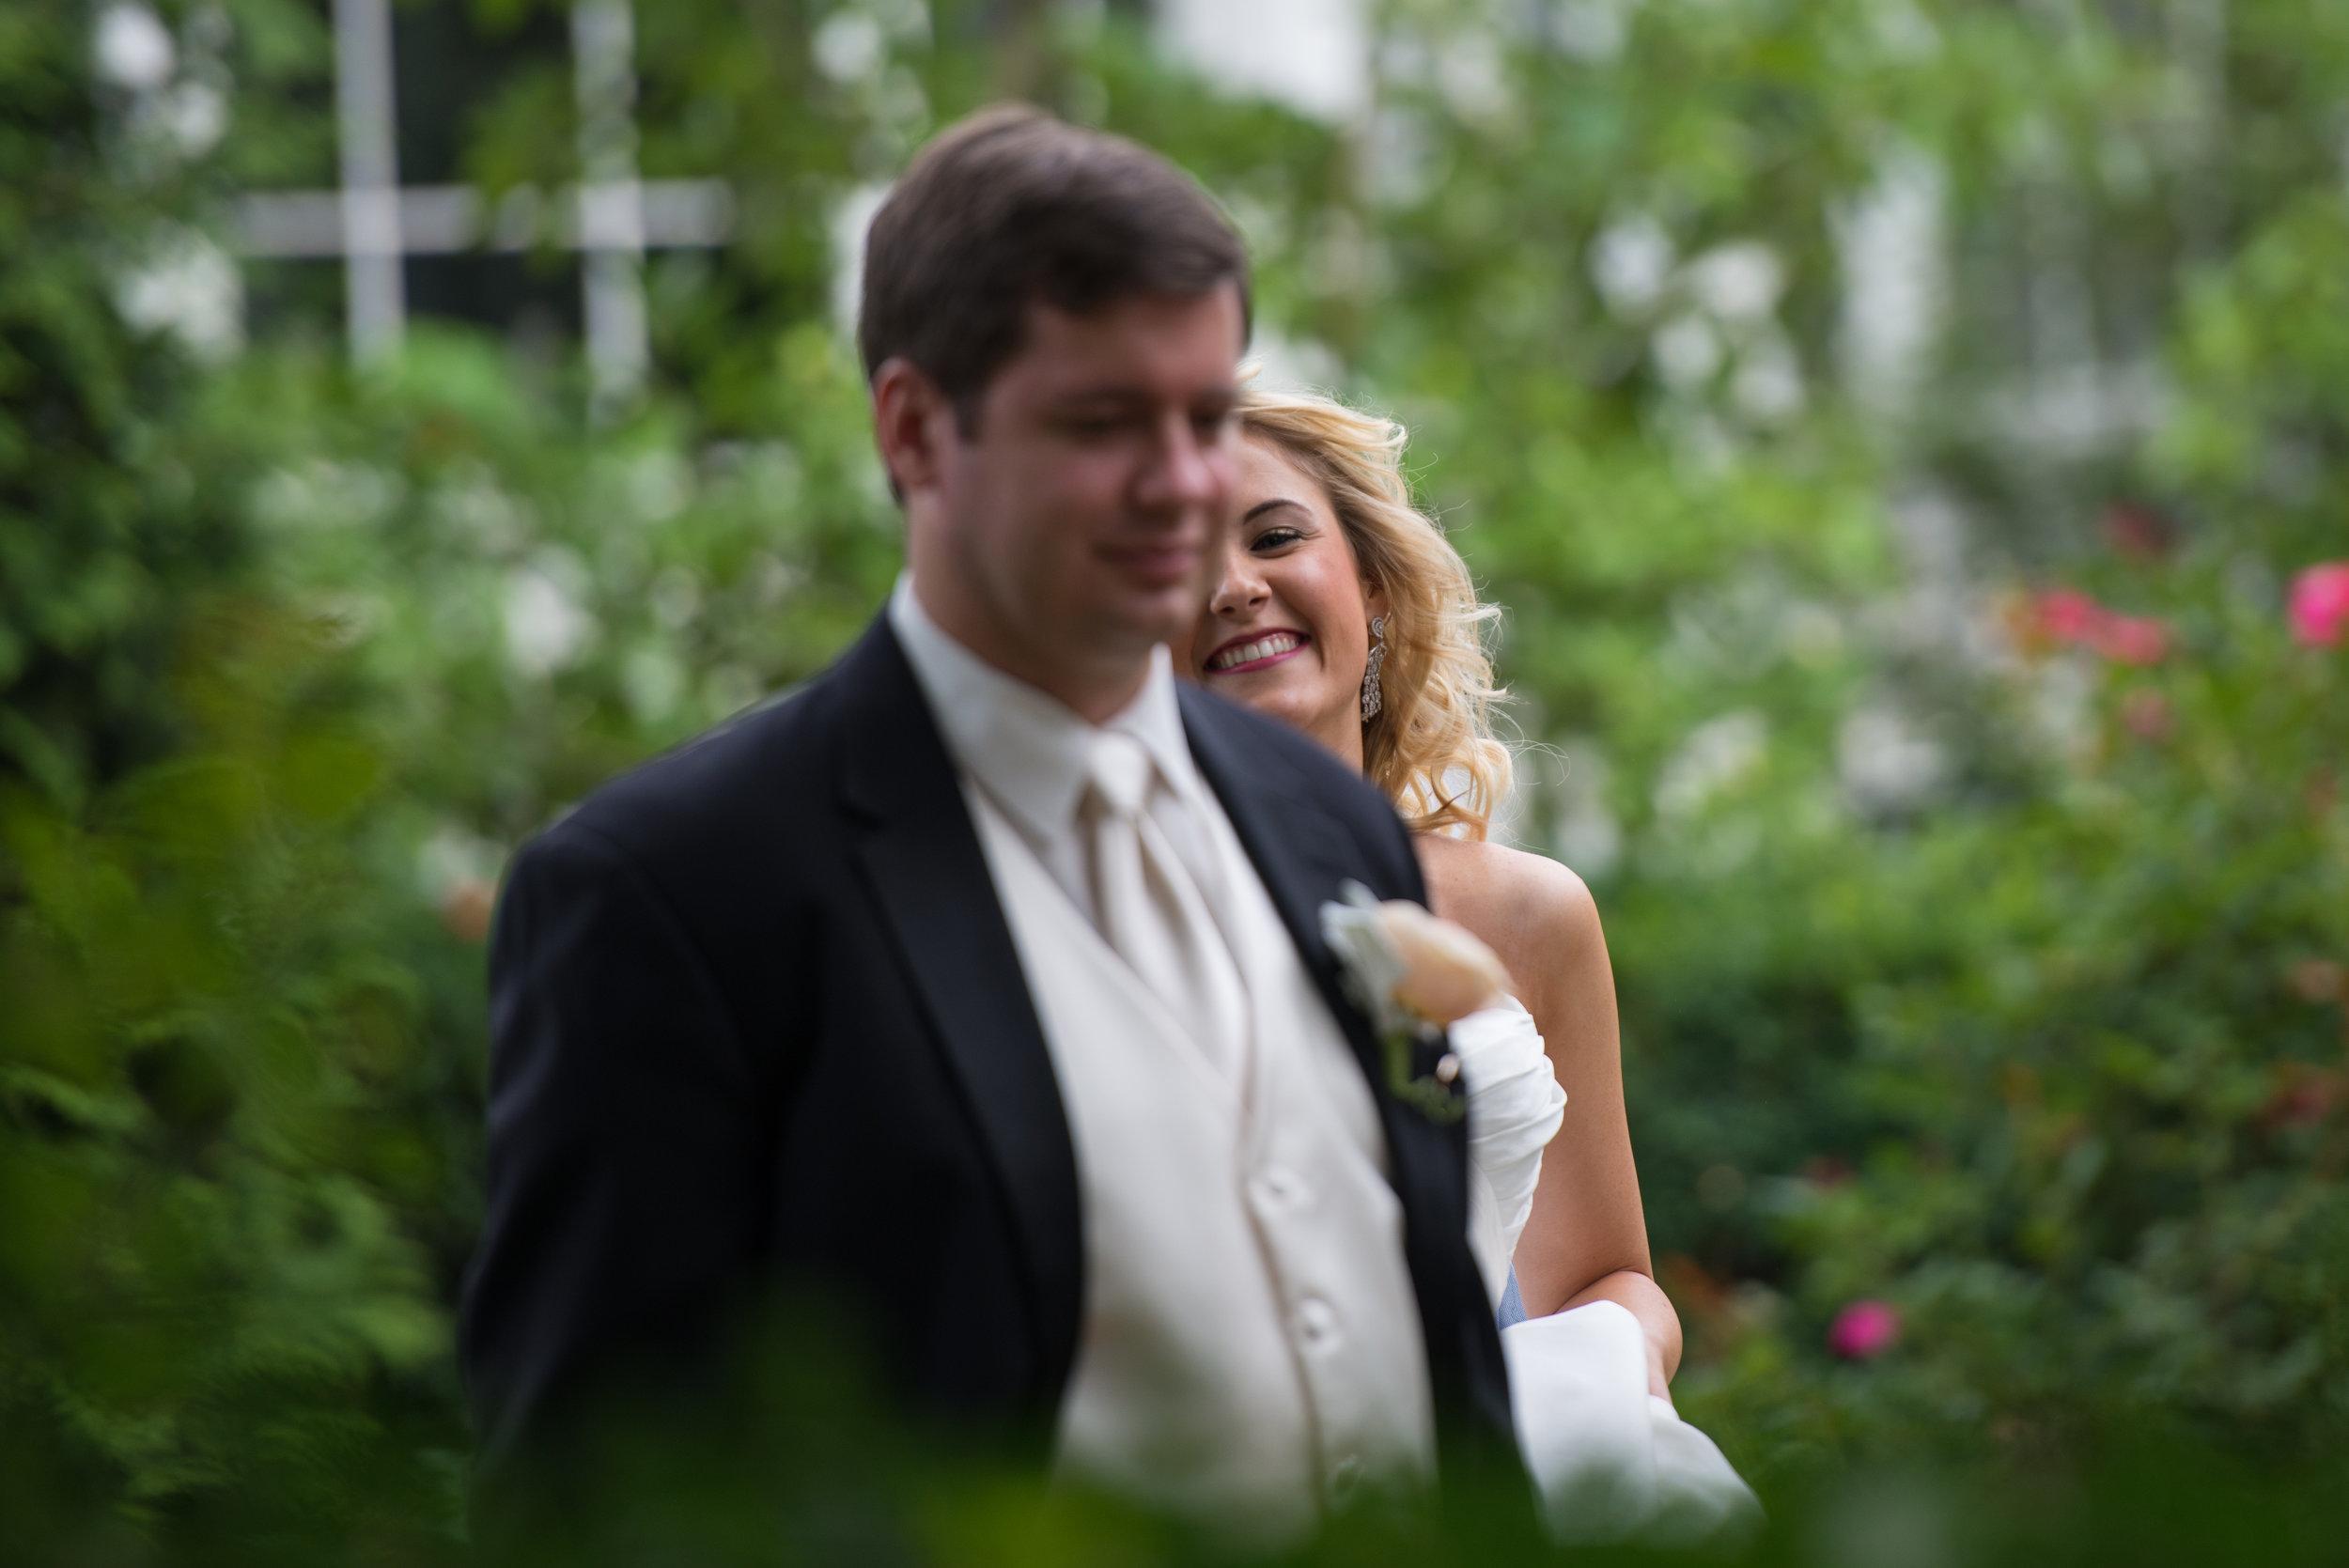 Wedding First Look Photos00923.jpg